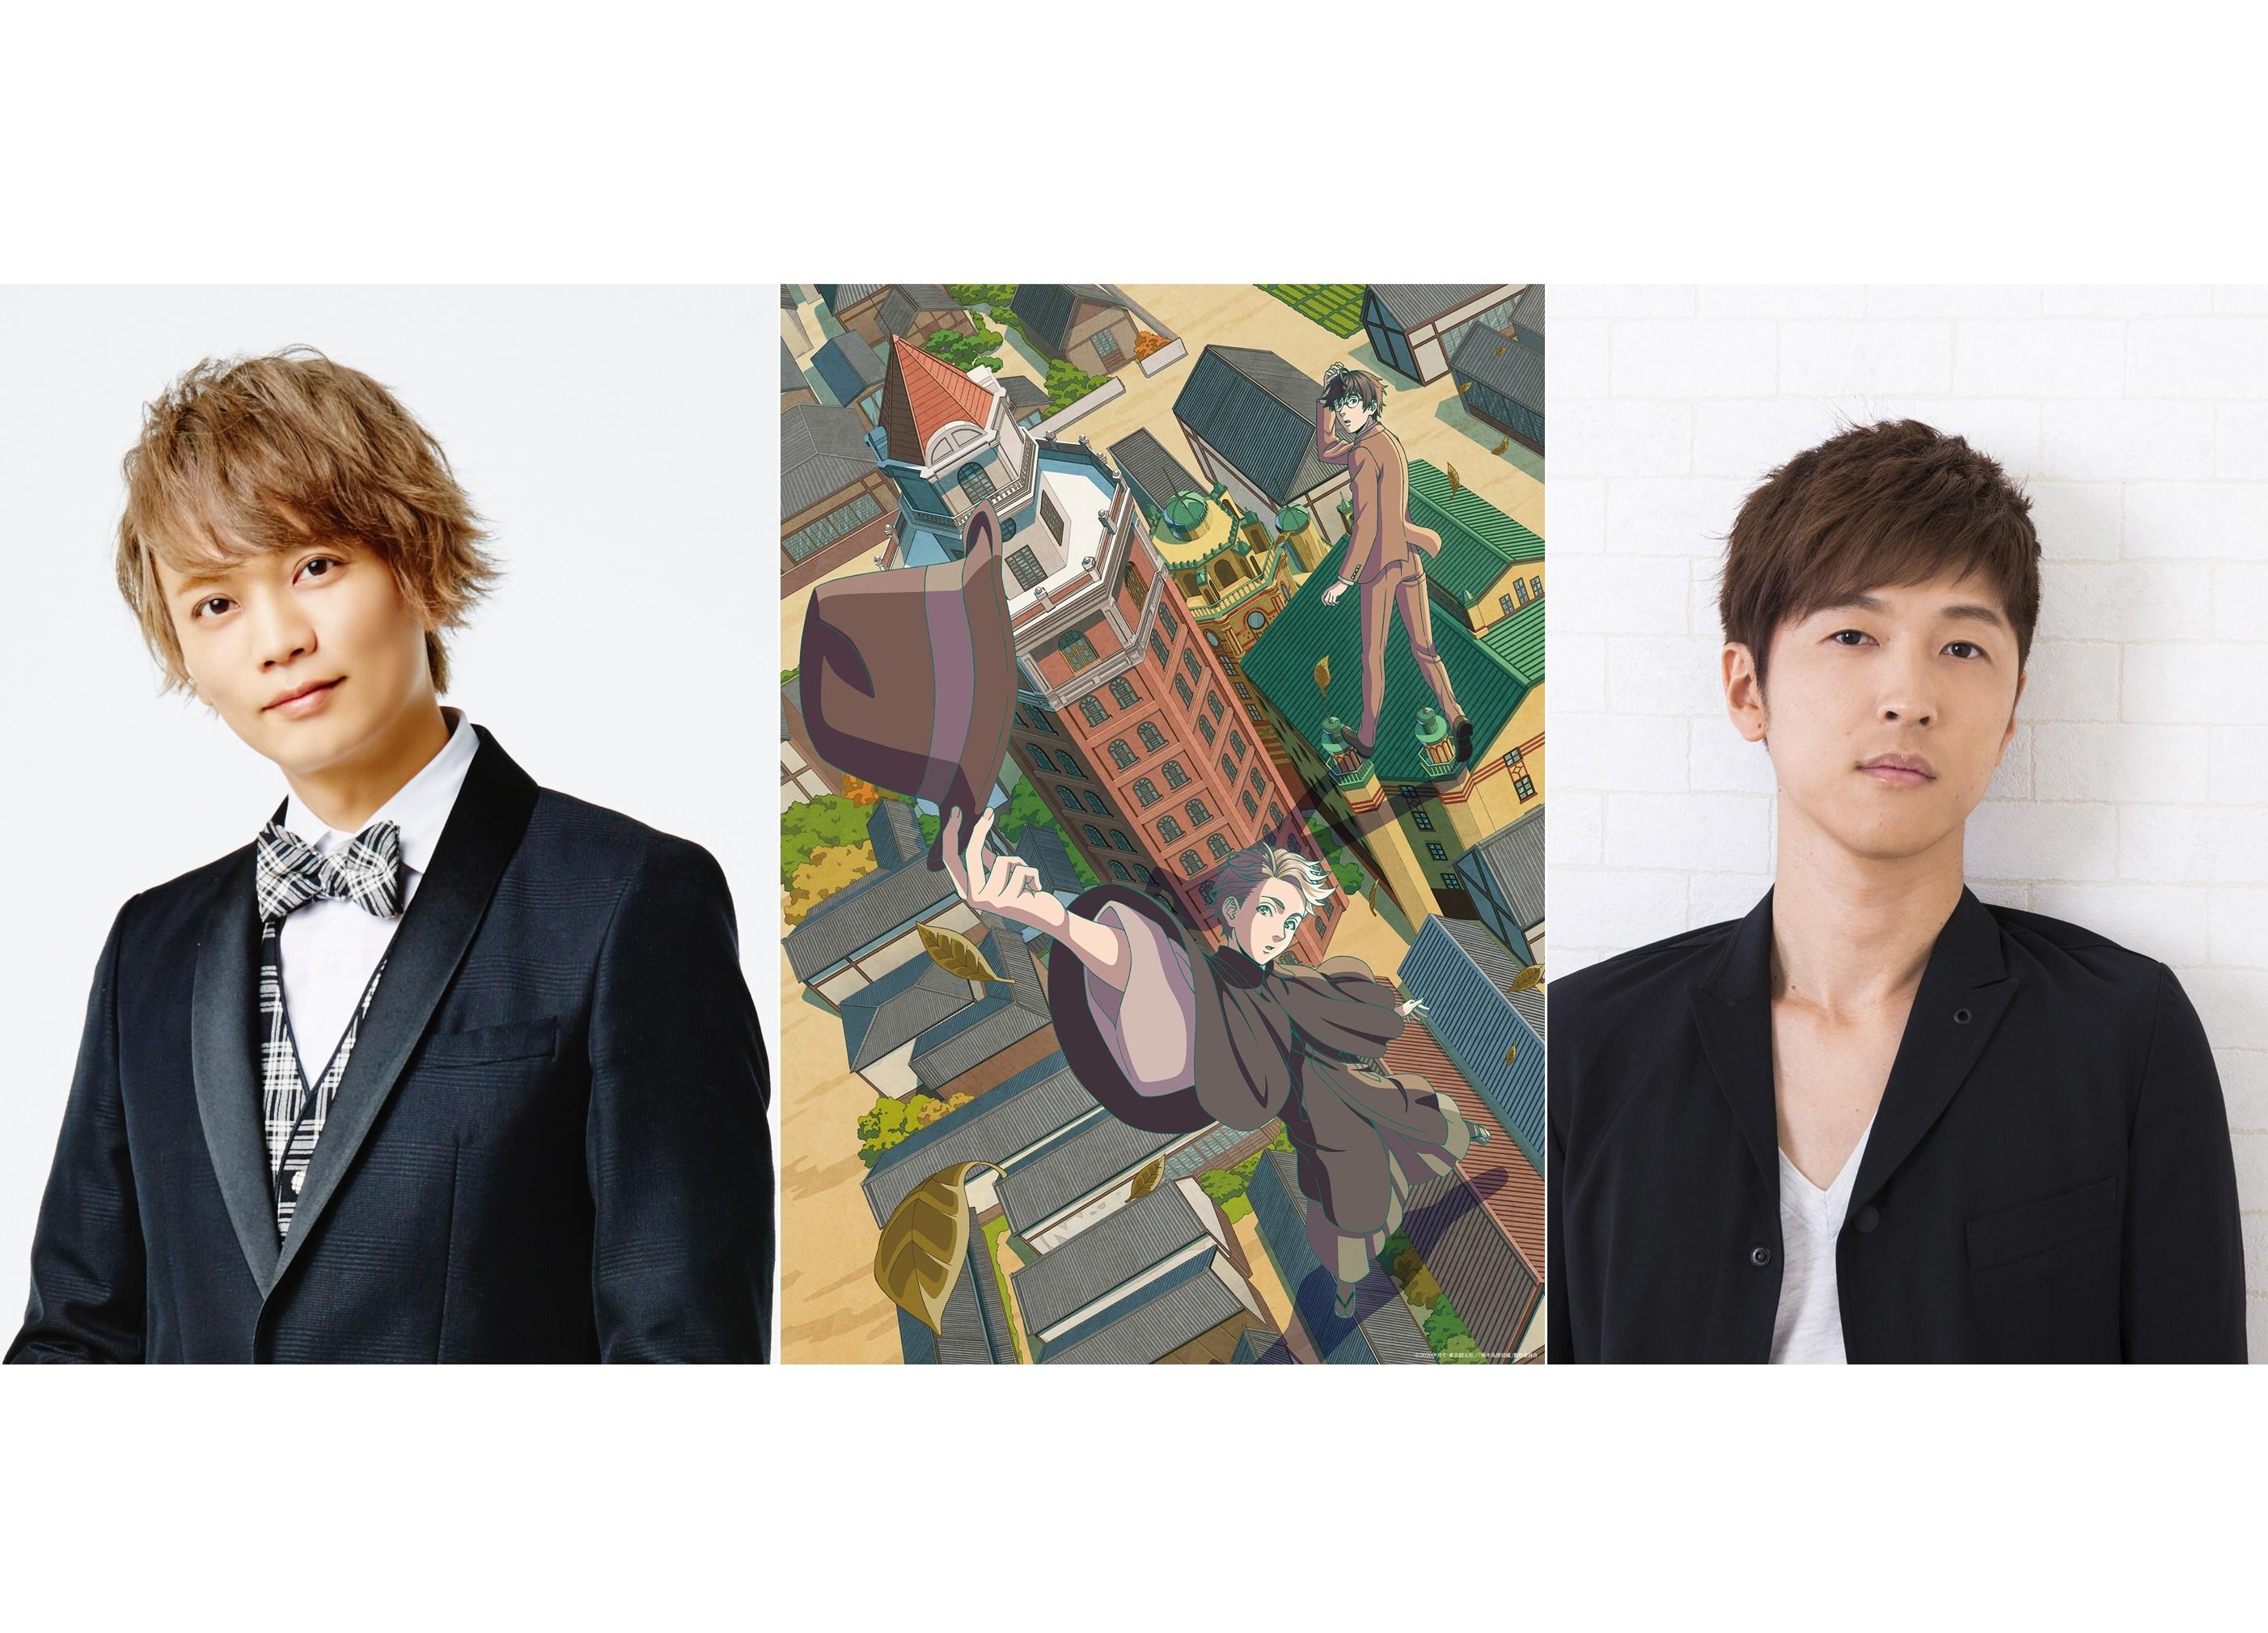 TVアニメ『啄木鳥探偵處』に浅沼晋太郎、櫻井孝宏が出演